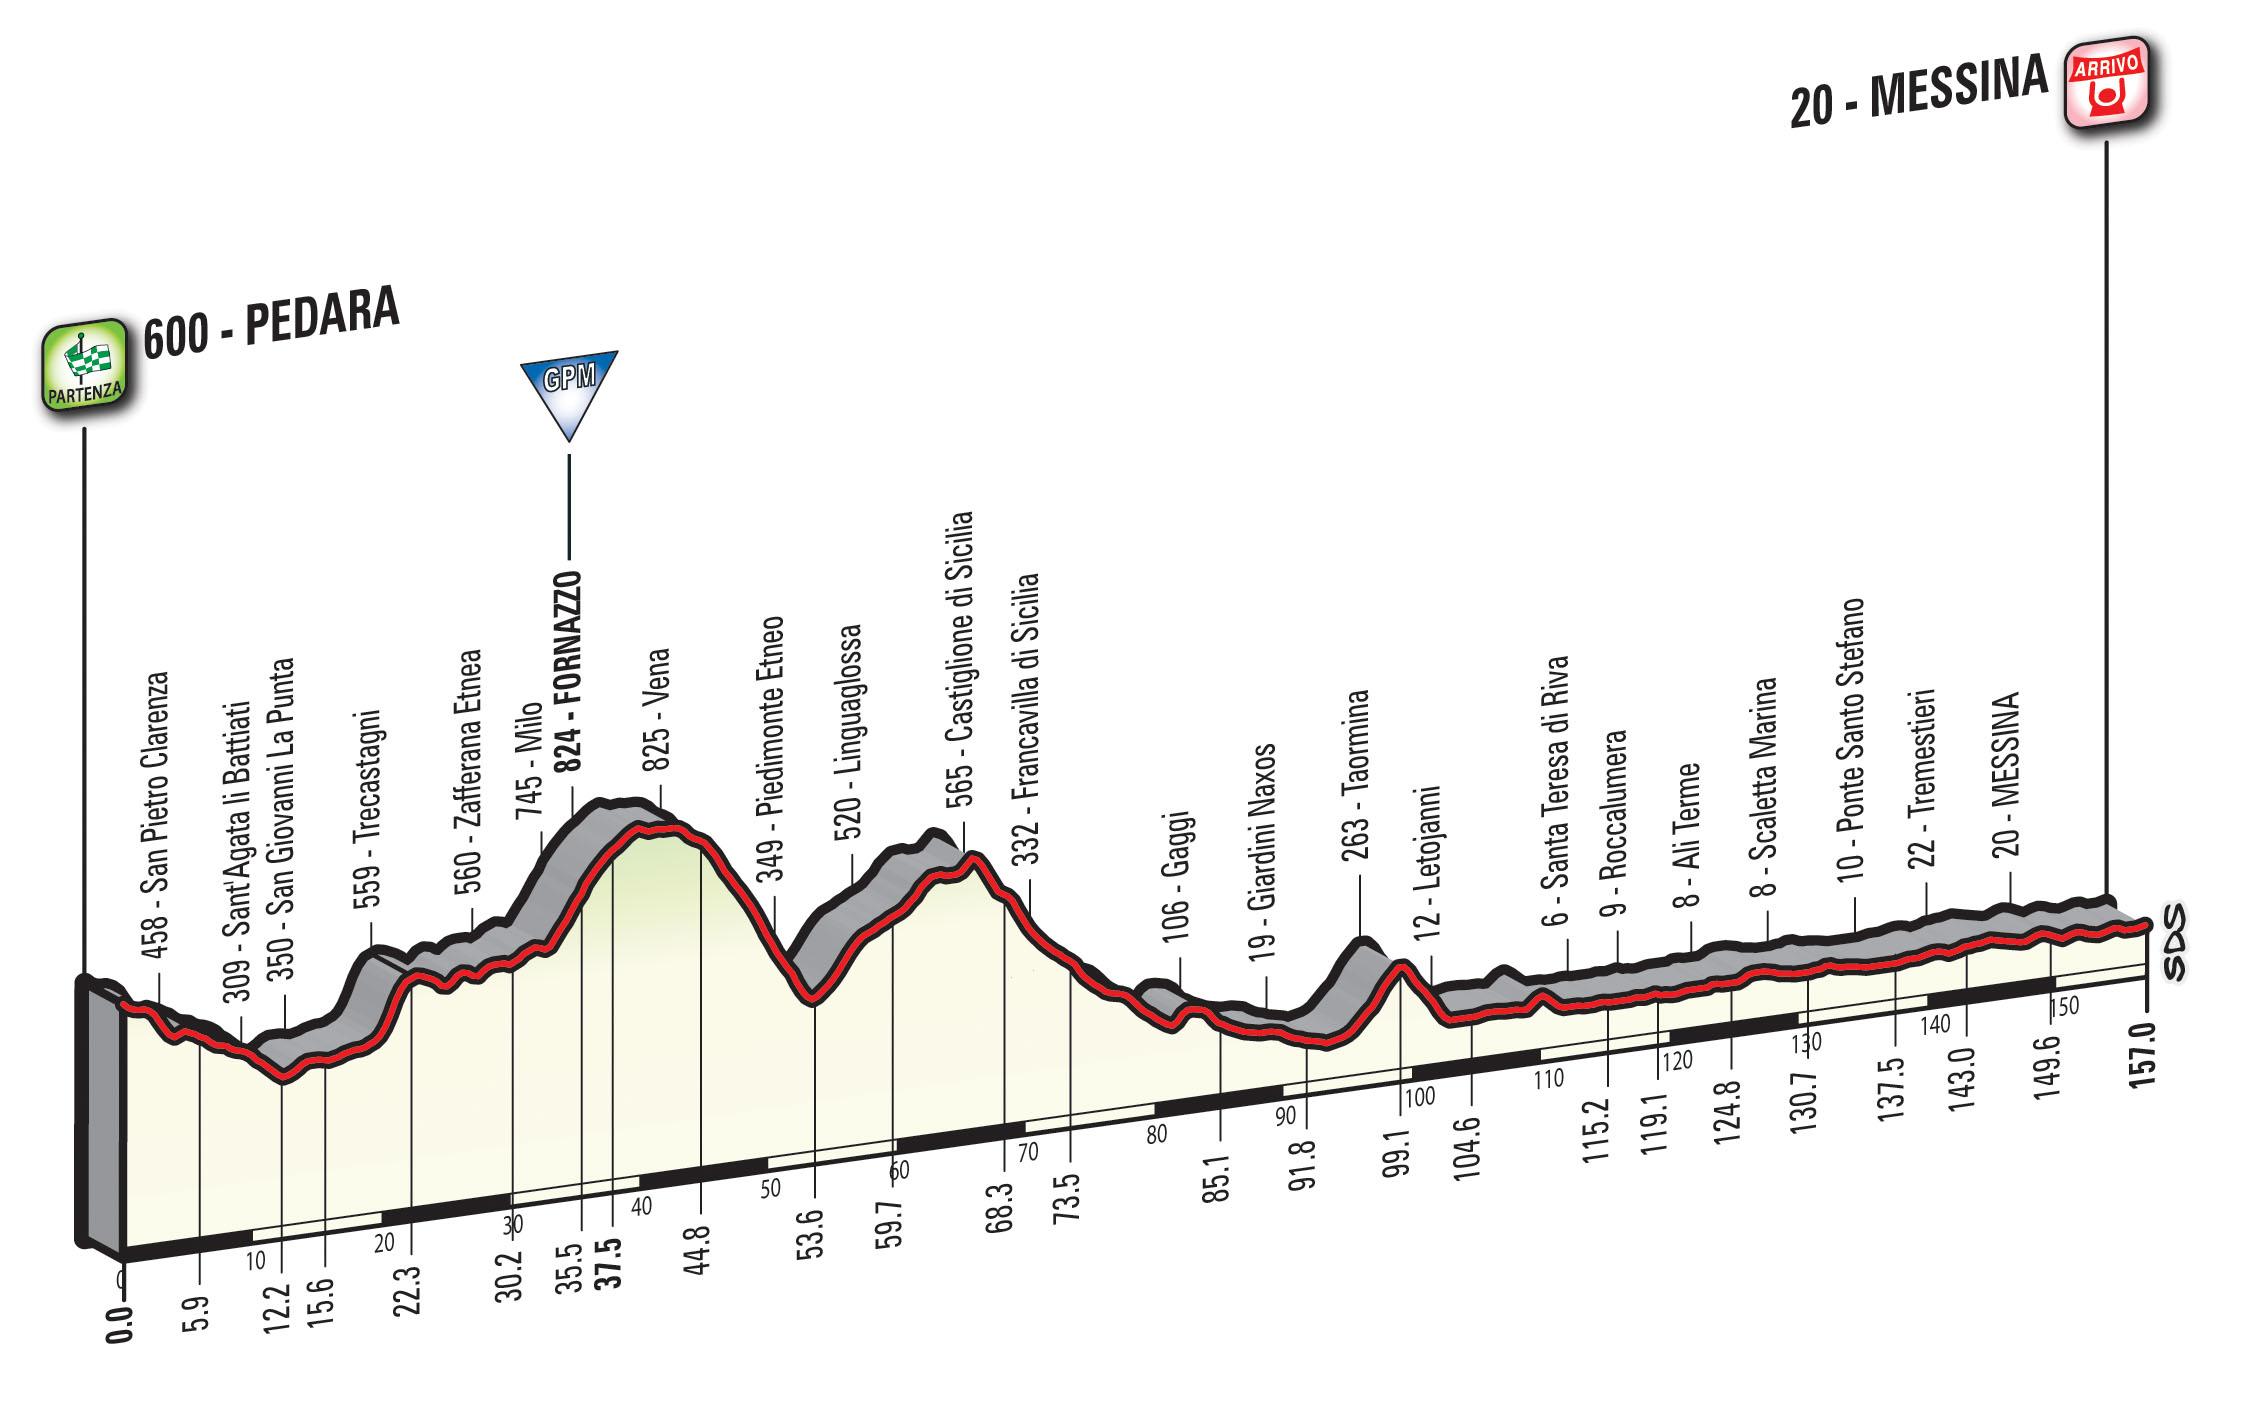 Giro d'Italia Pedara - Messina